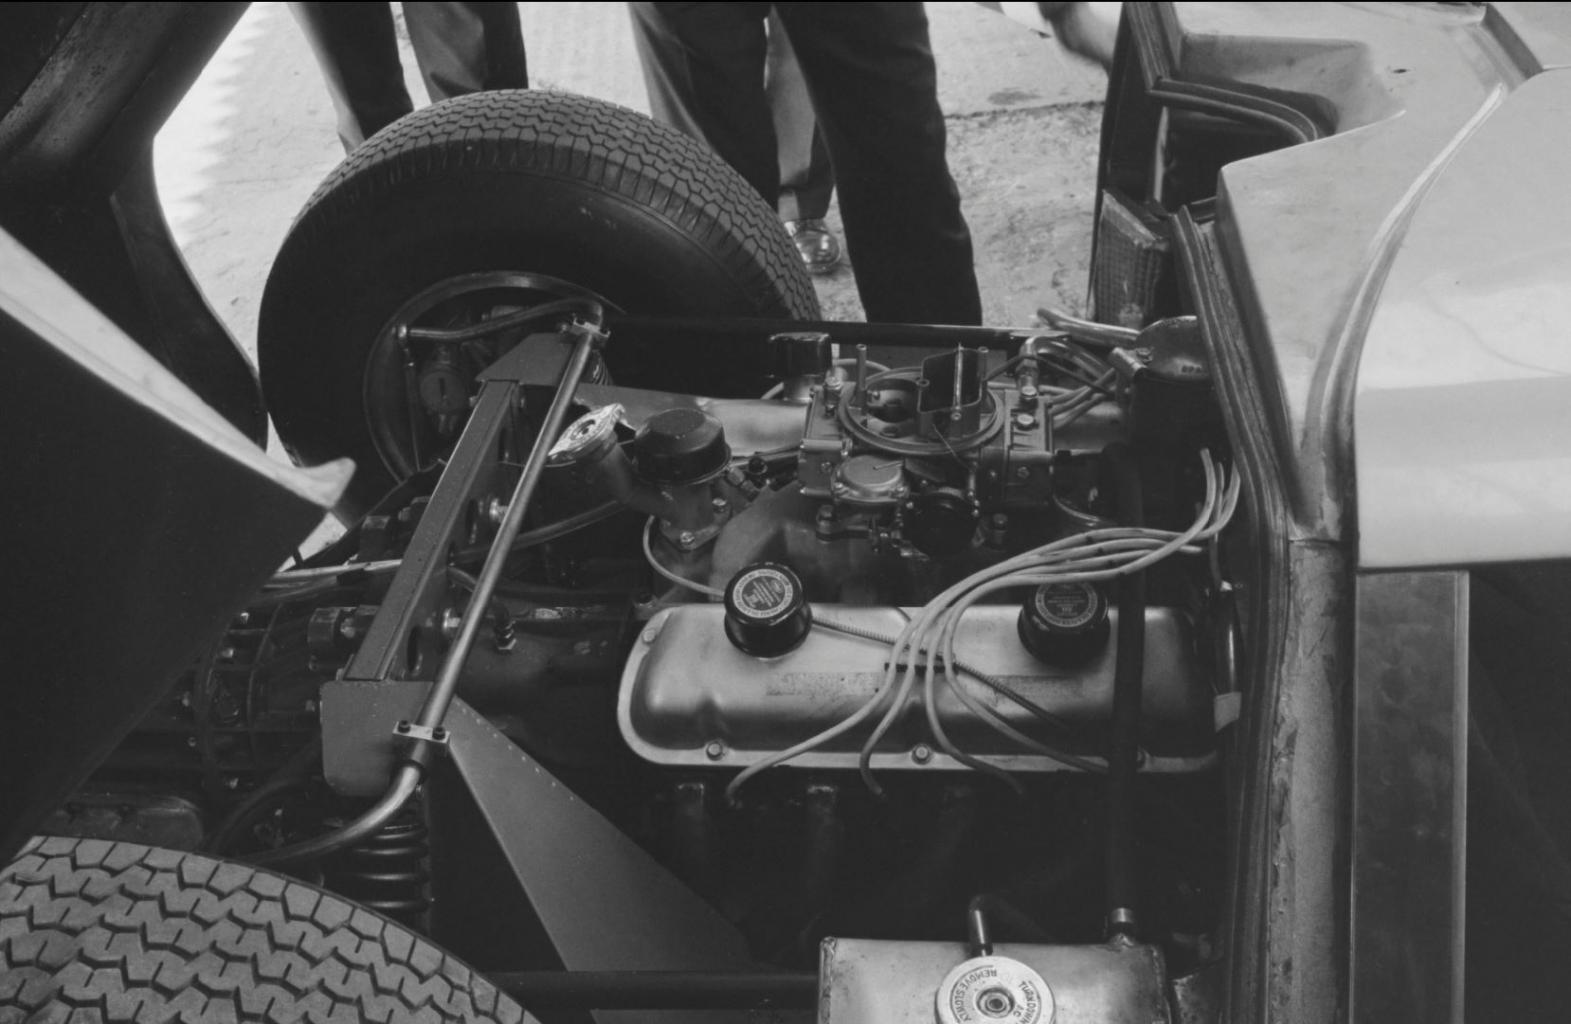 Lola GT MK6 Early Photos-63-silverstone-lola-gt-mk6-h-jpg